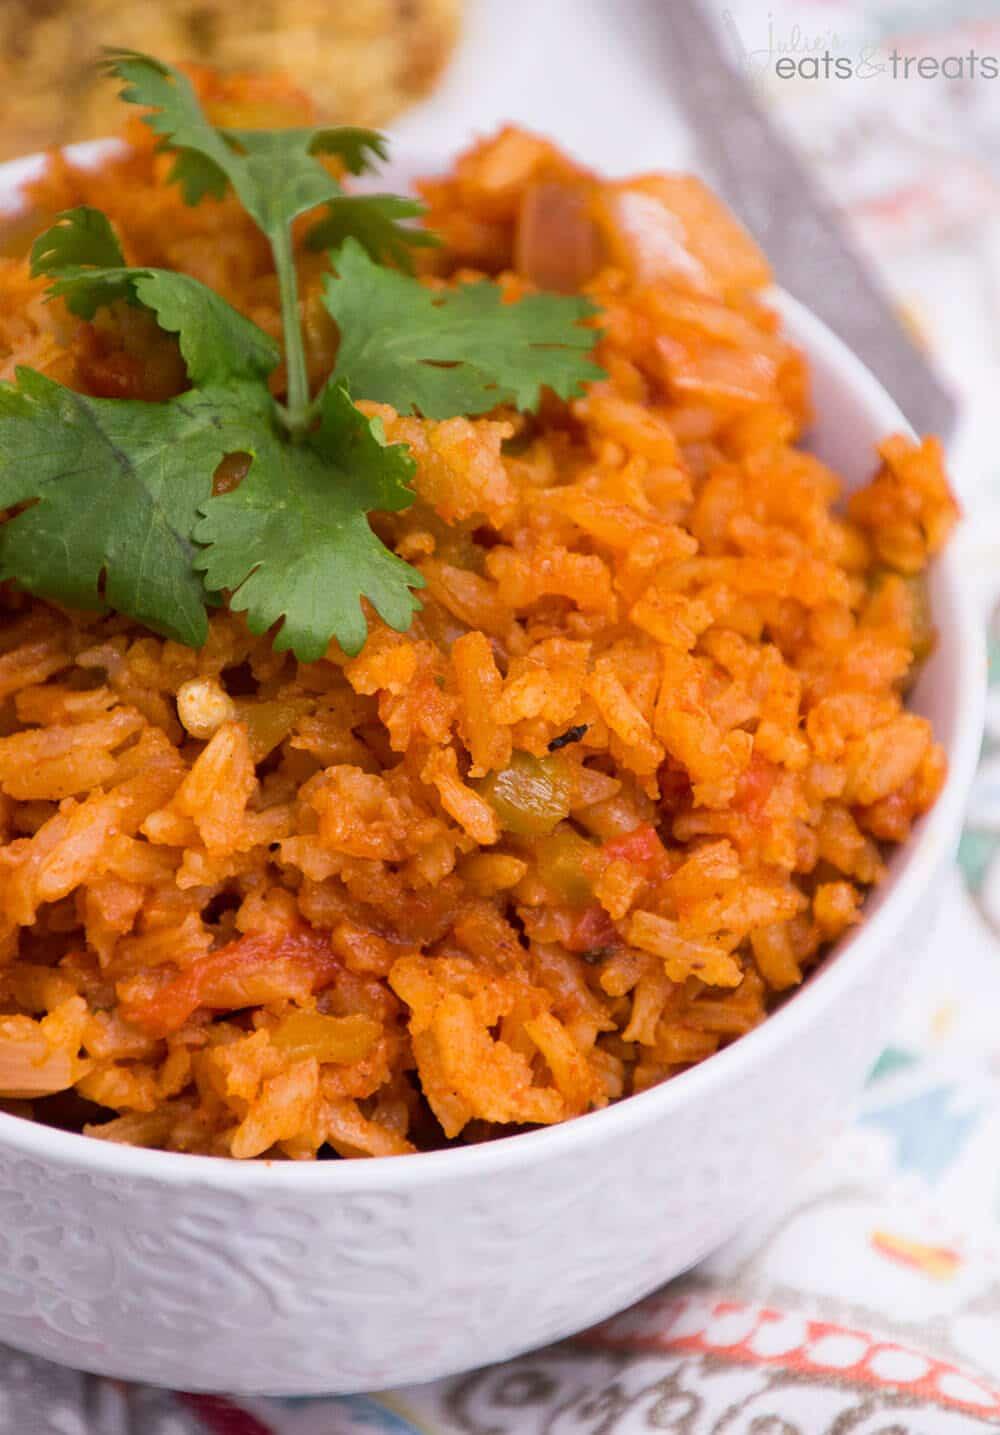 How to easily make spanish rice